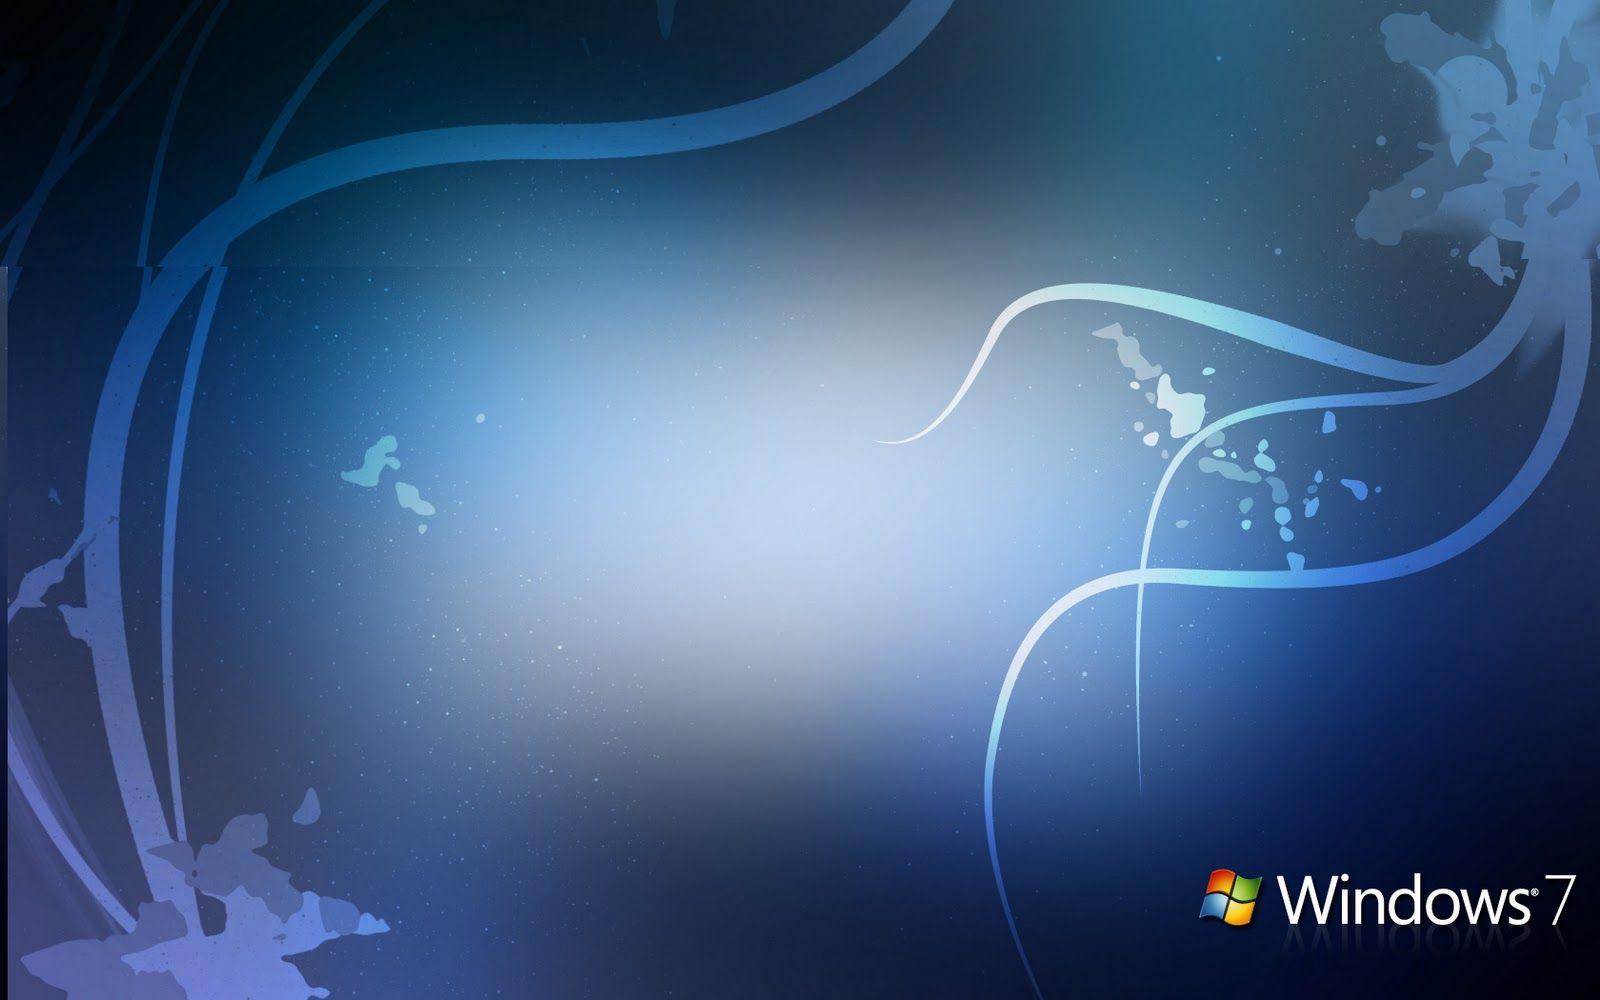 Wallpaper  Desktop  Bergerak  Windows  7  Terlengkap A1